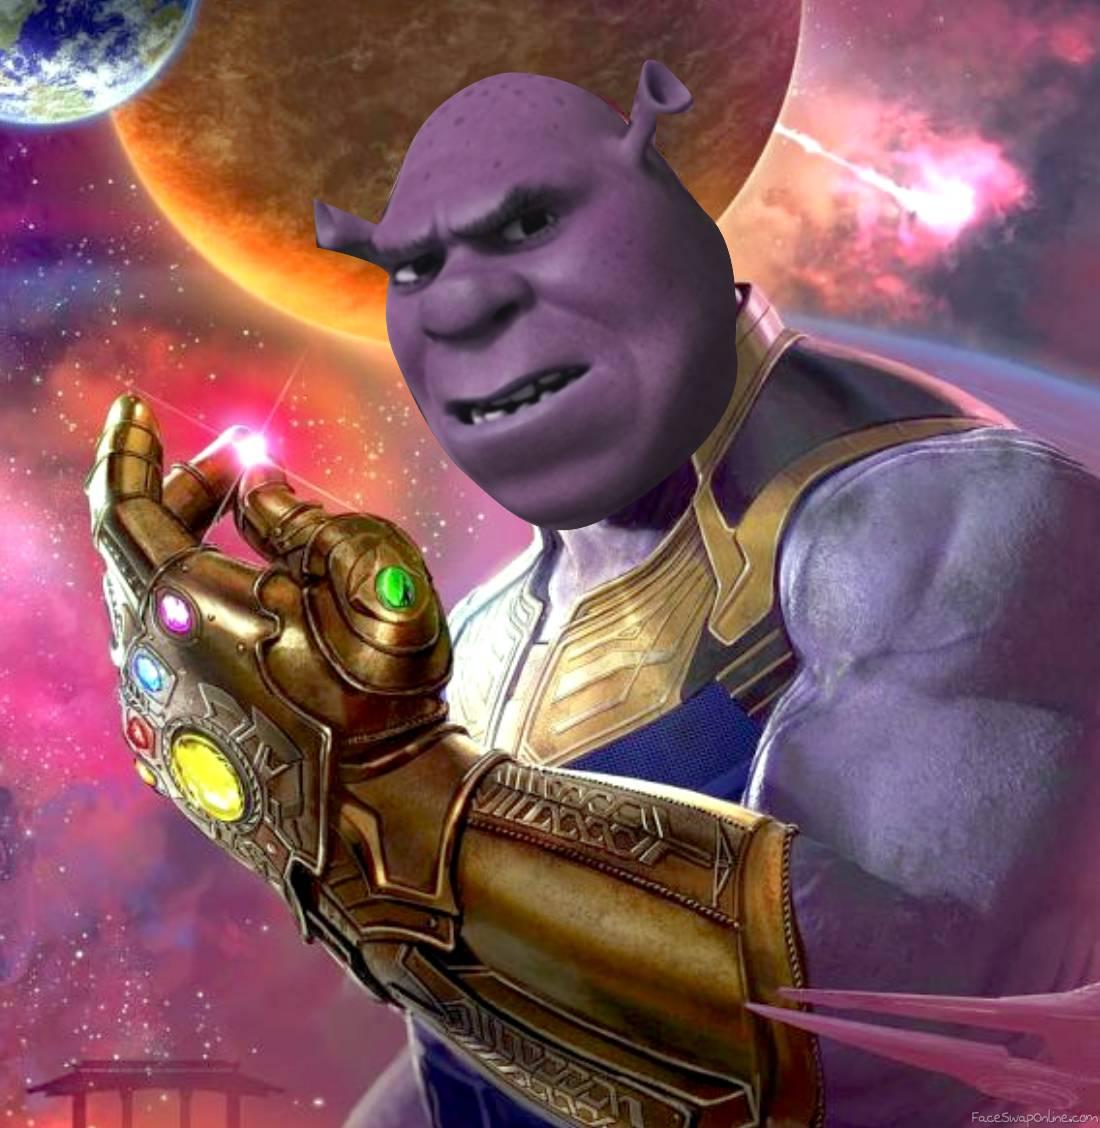 Thanos Shrek snap